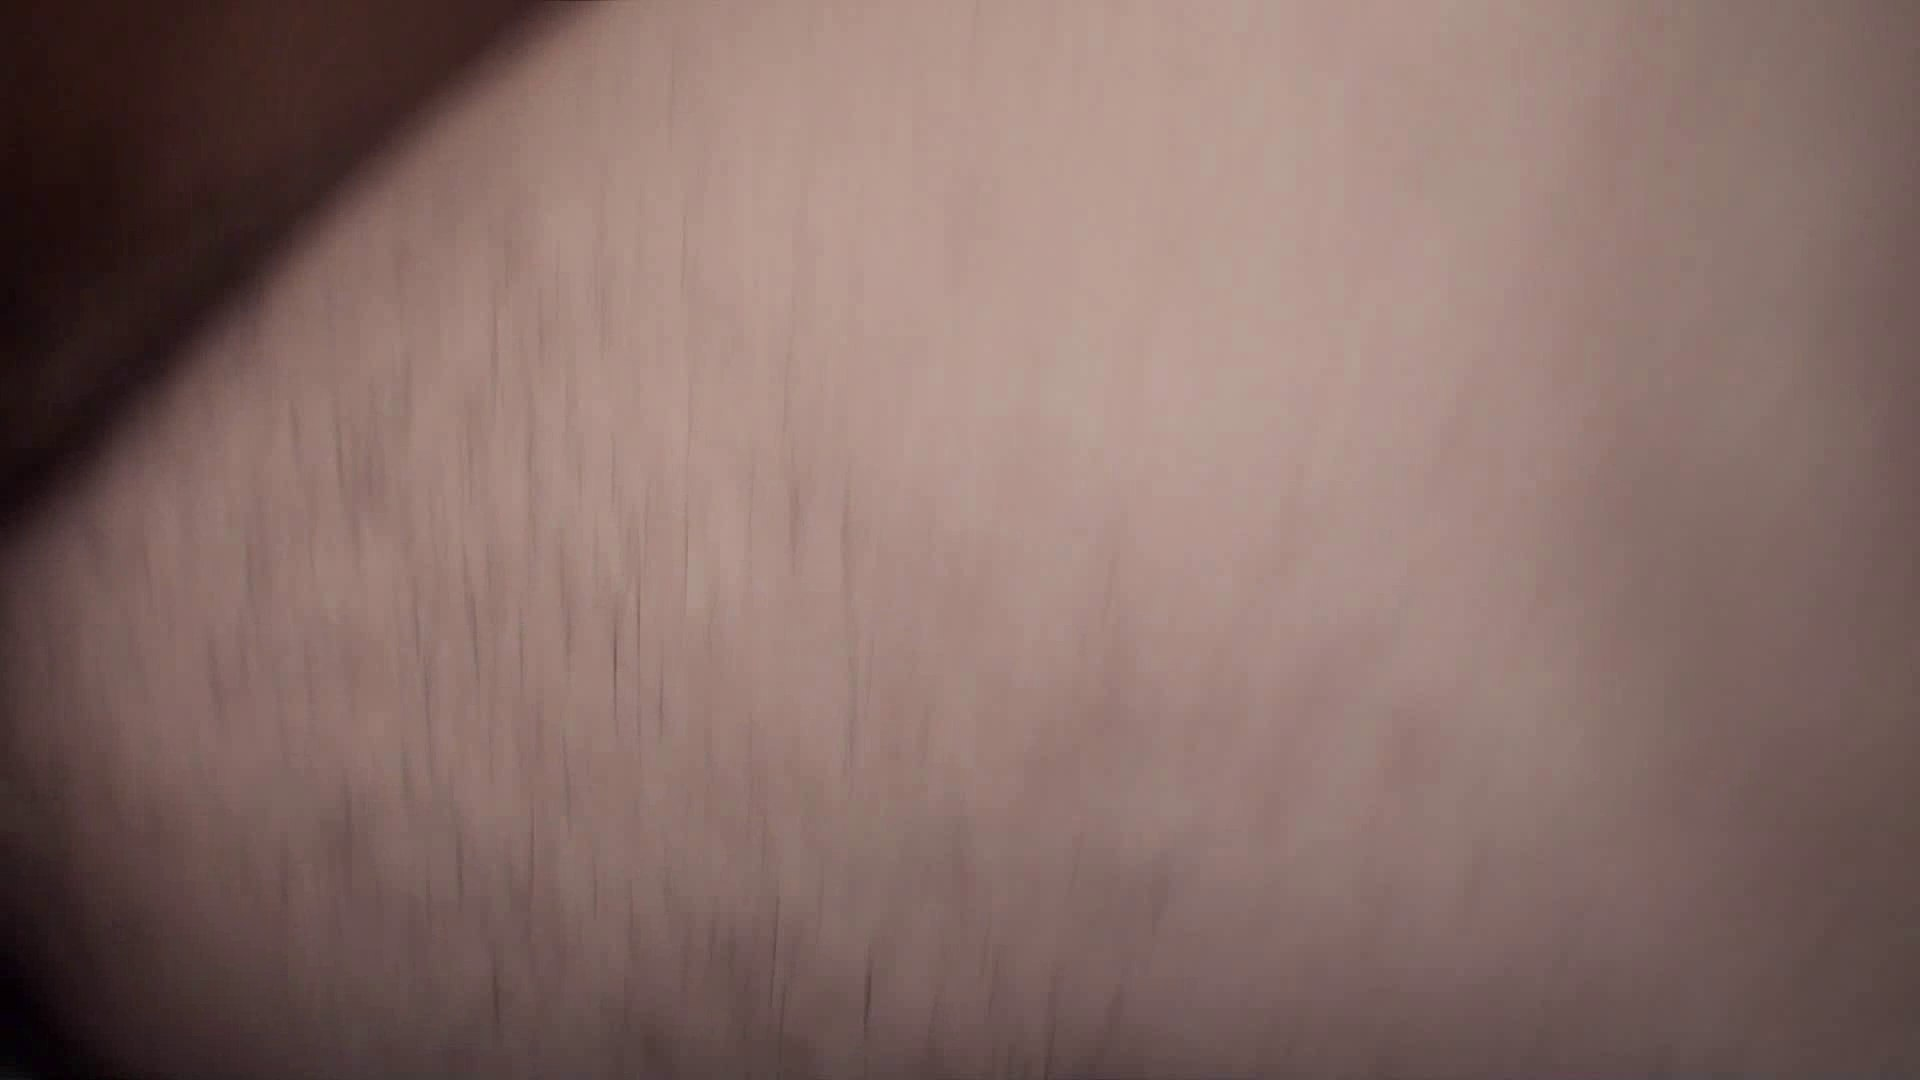 HD 良太と健二当たり前の日常 セックス編 男天国 | サル系ボーイズ  50pic 29